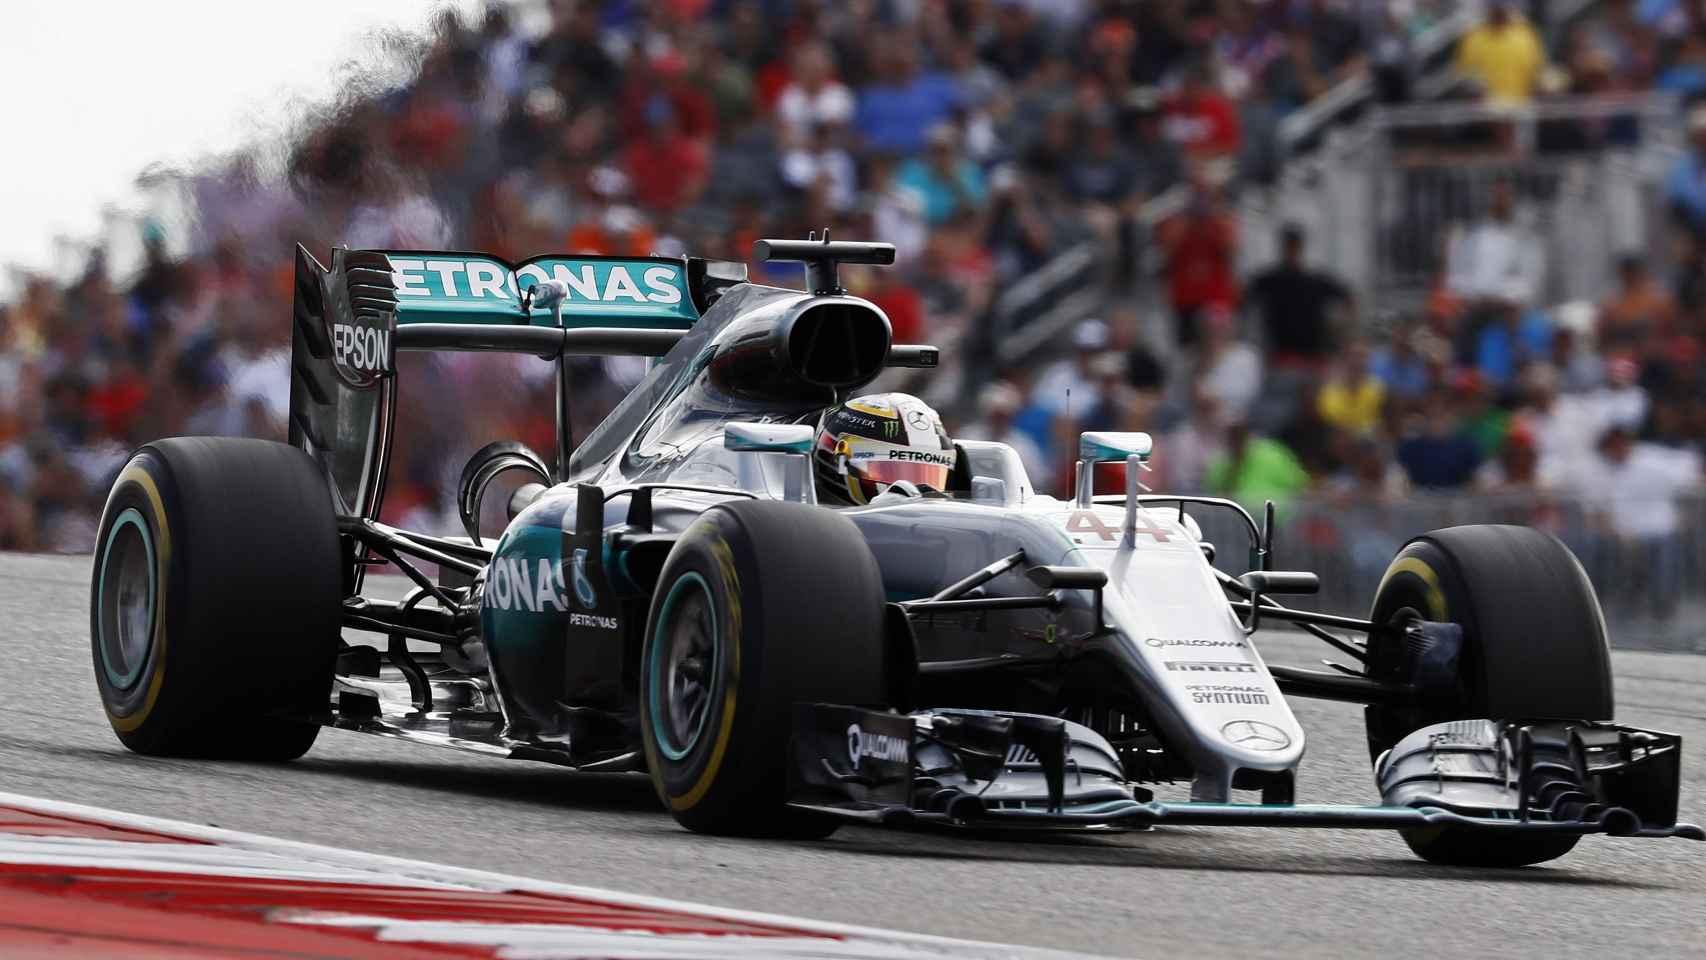 United States Formula One Grand Prix